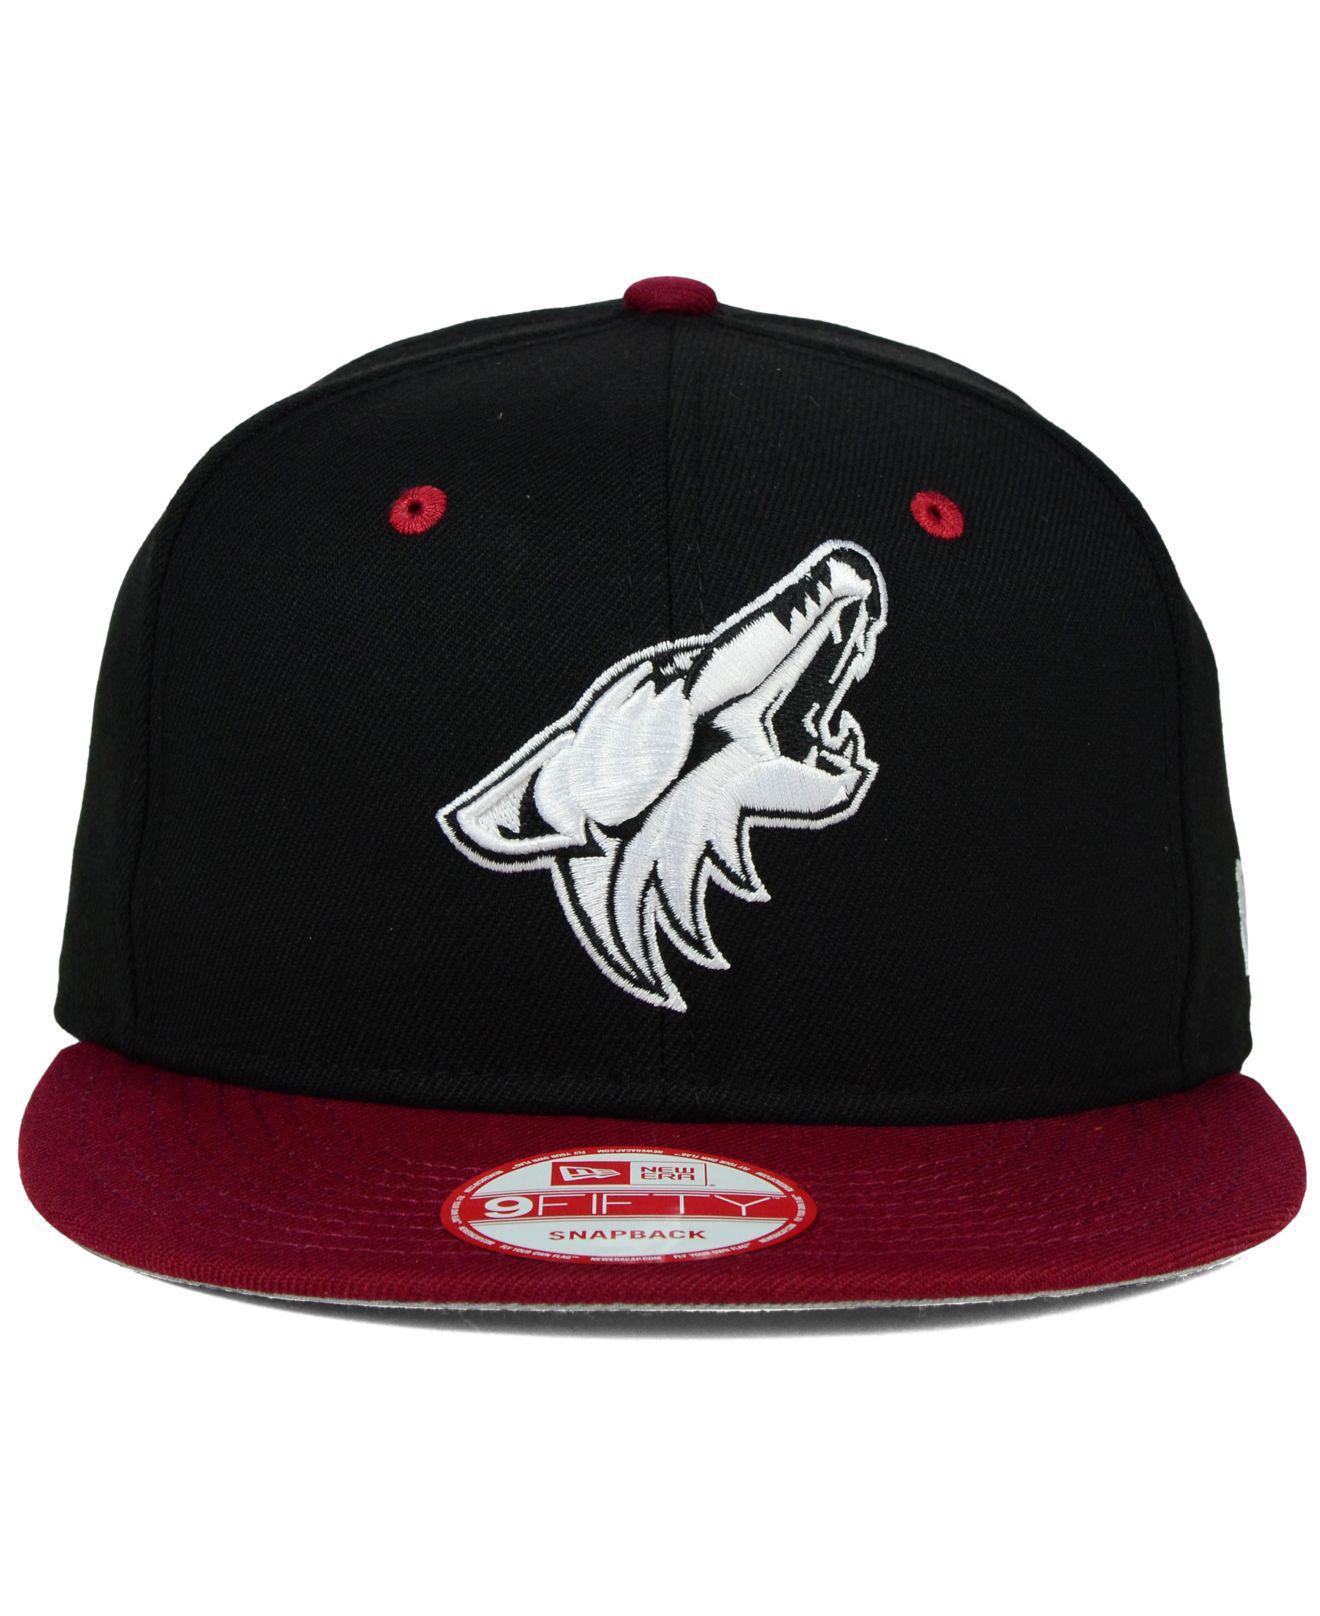 reputable site 3e0ac 78e44 ... canada lyst ktz arizona coyotes black white team color 9fifty snapback  cap for men a80e4 f335a